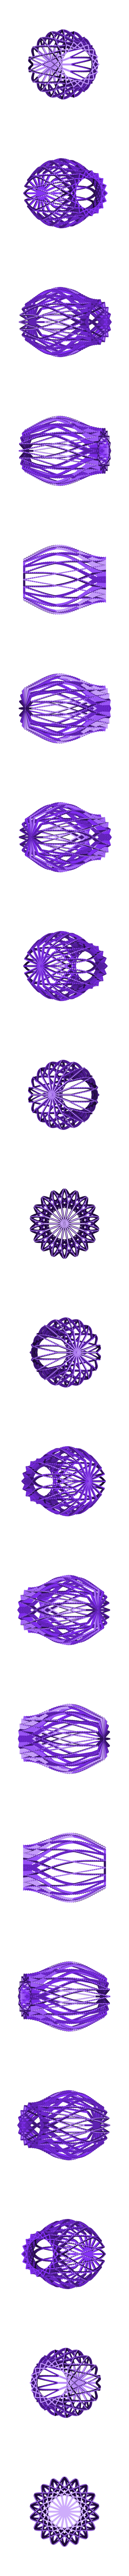 vase_exp_A04.stl Download free STL file Reasonable Vases • 3D printer design, Zippityboomba